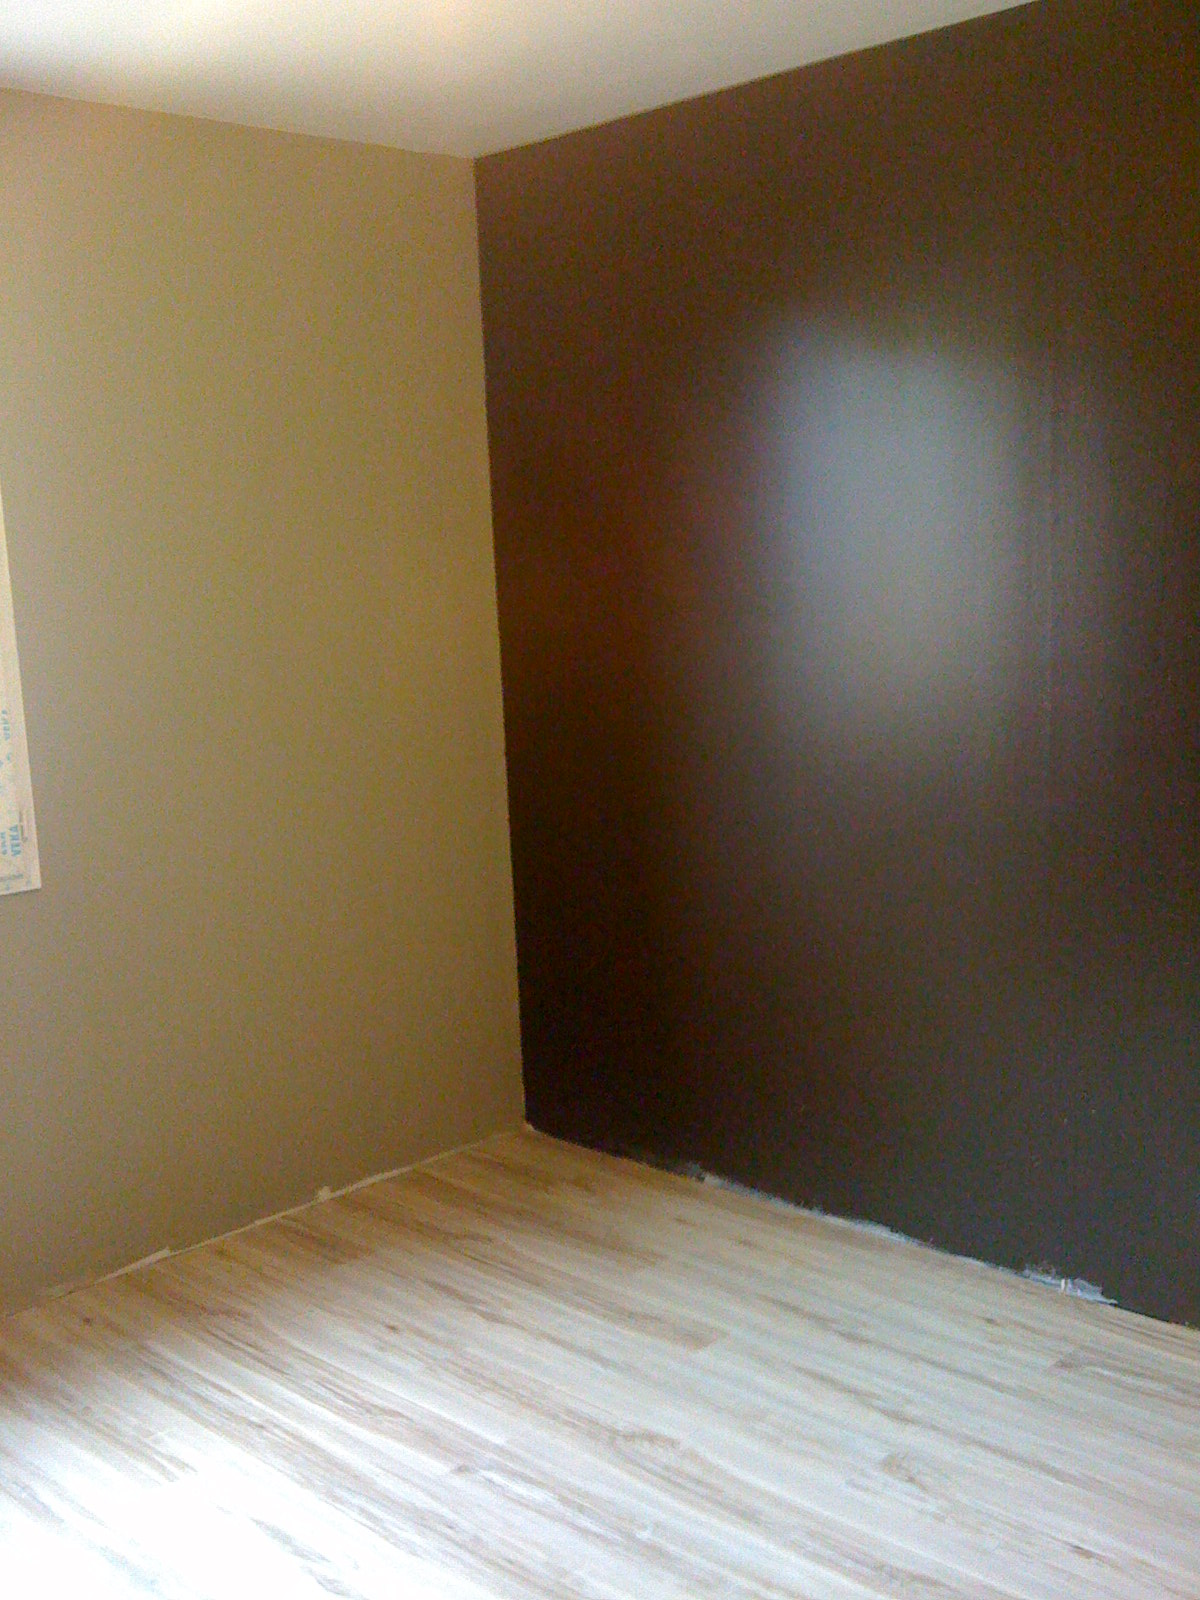 2009 juin 11 notre projet maison phenix. Black Bedroom Furniture Sets. Home Design Ideas